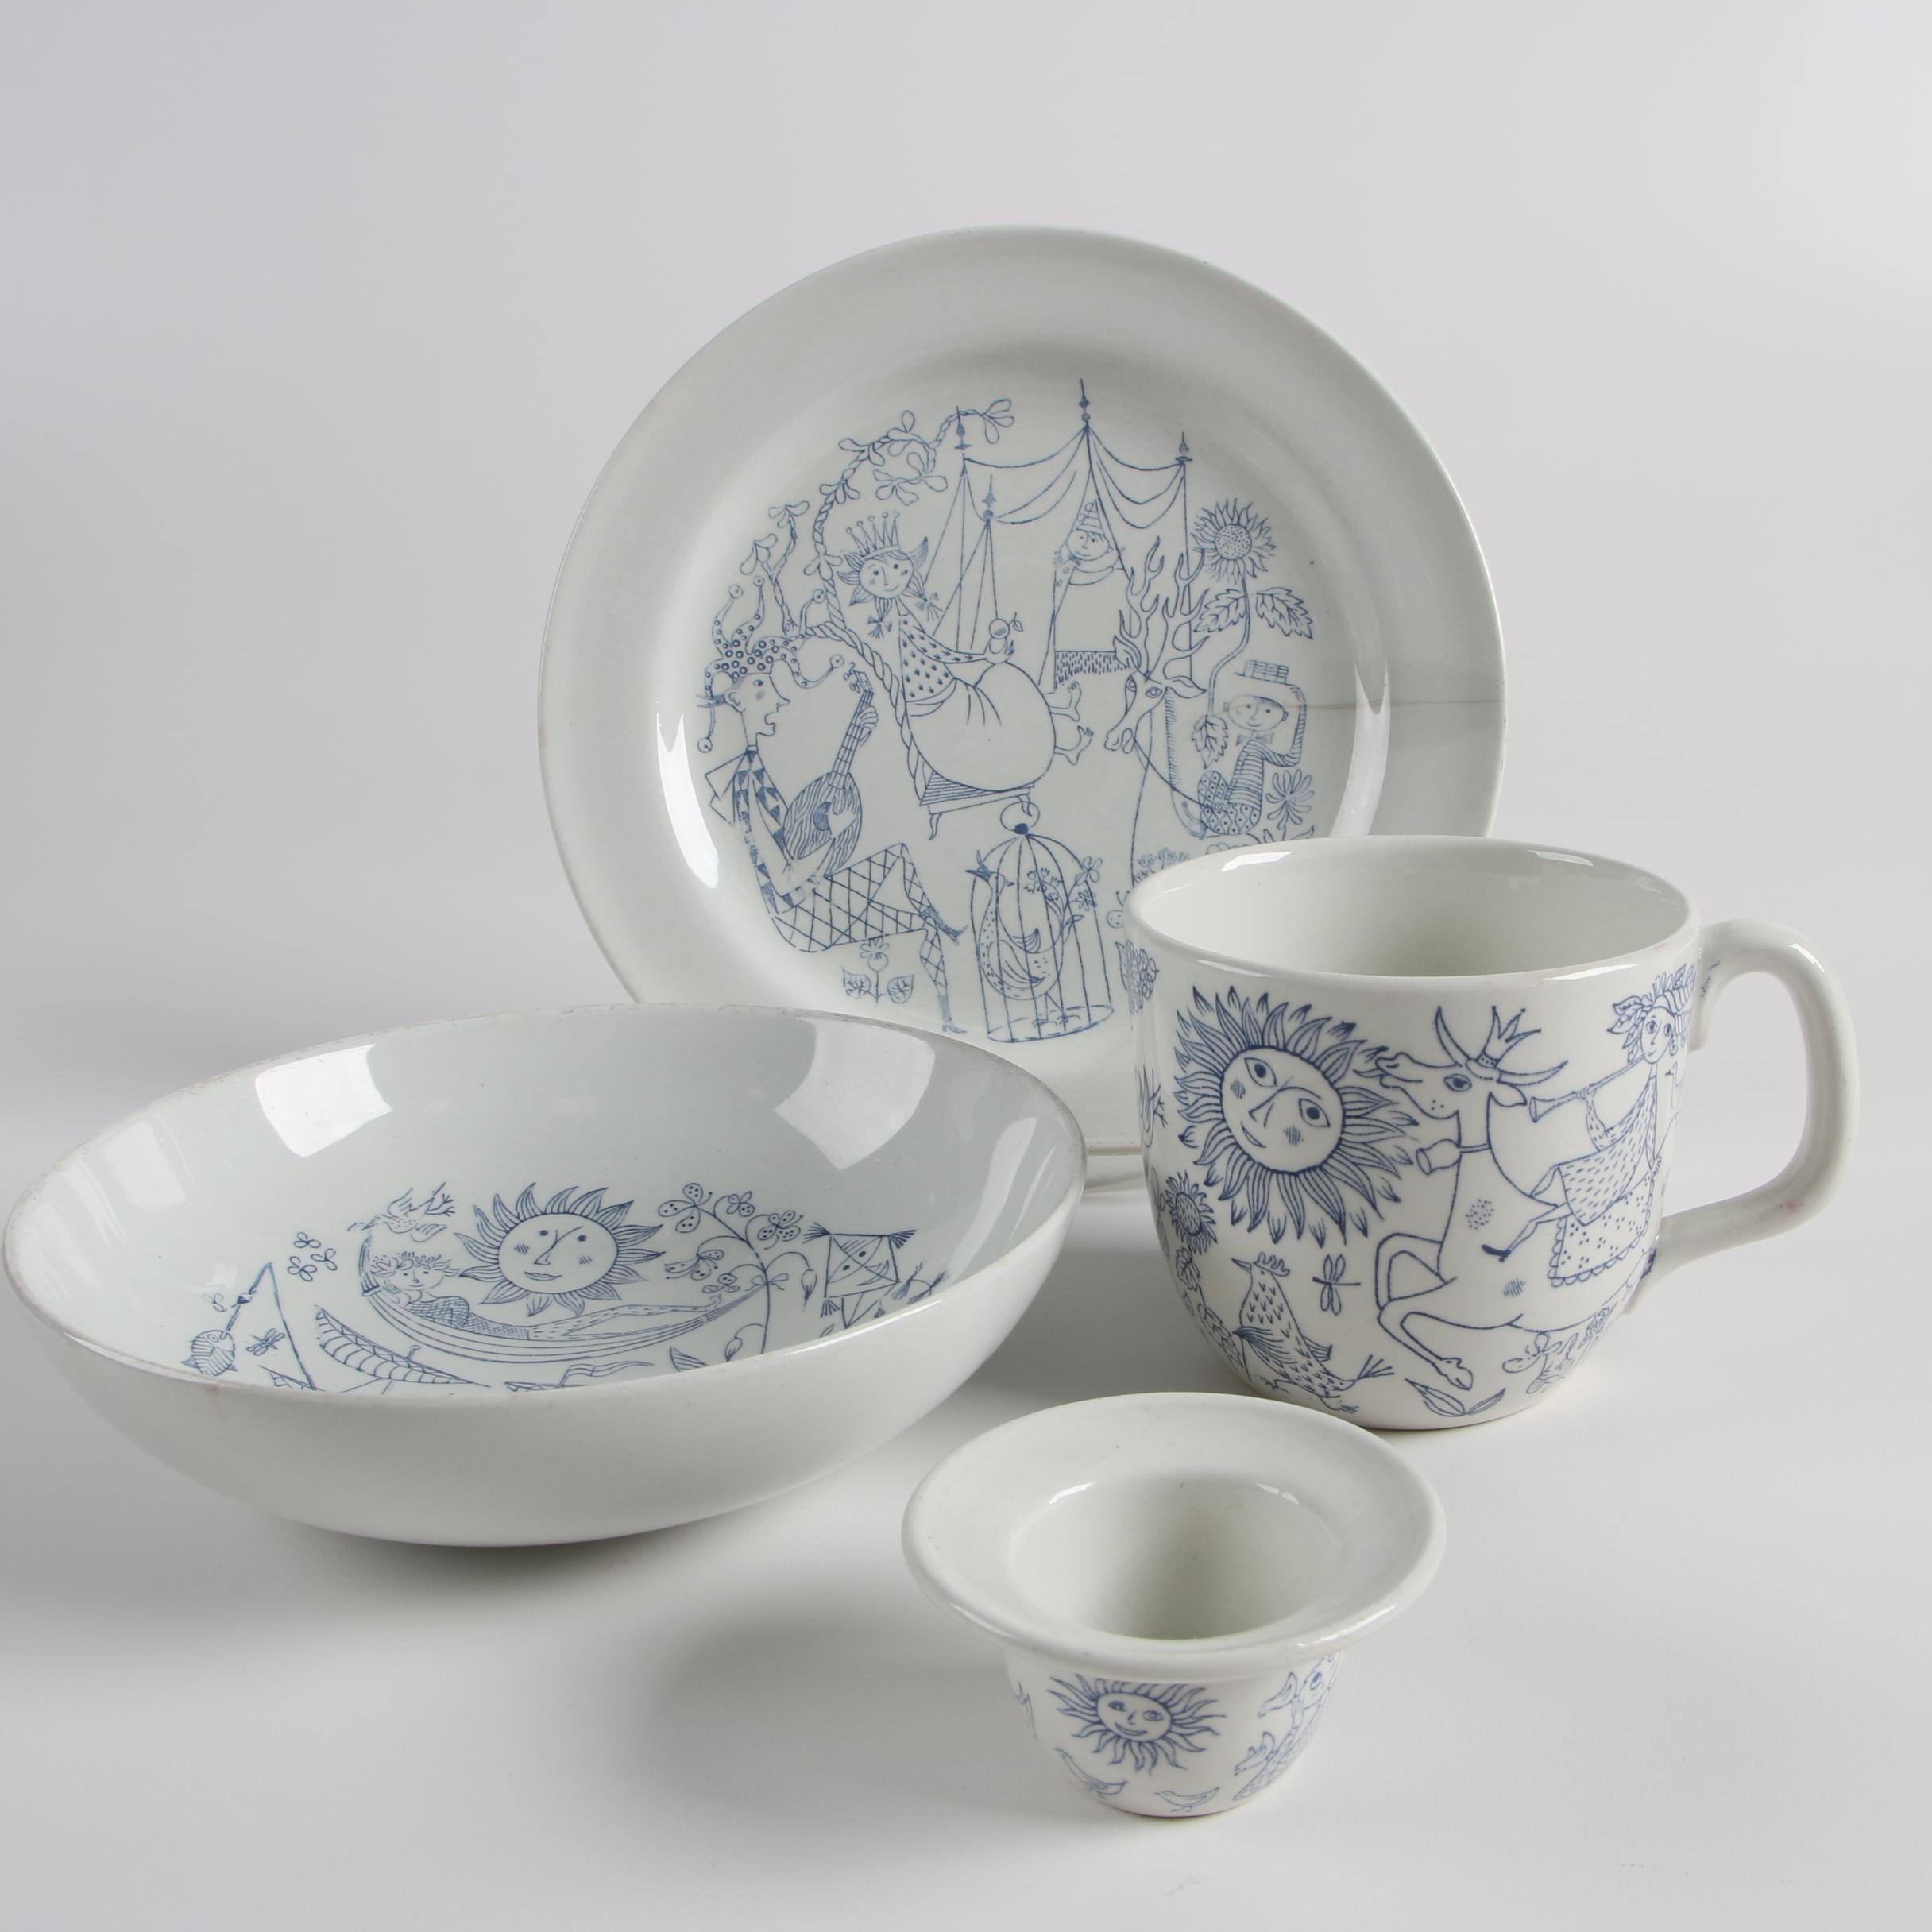 "1950s Stig Lindberg for Gustavsberg ""Sagoland"" Stoneware Dinnerware"